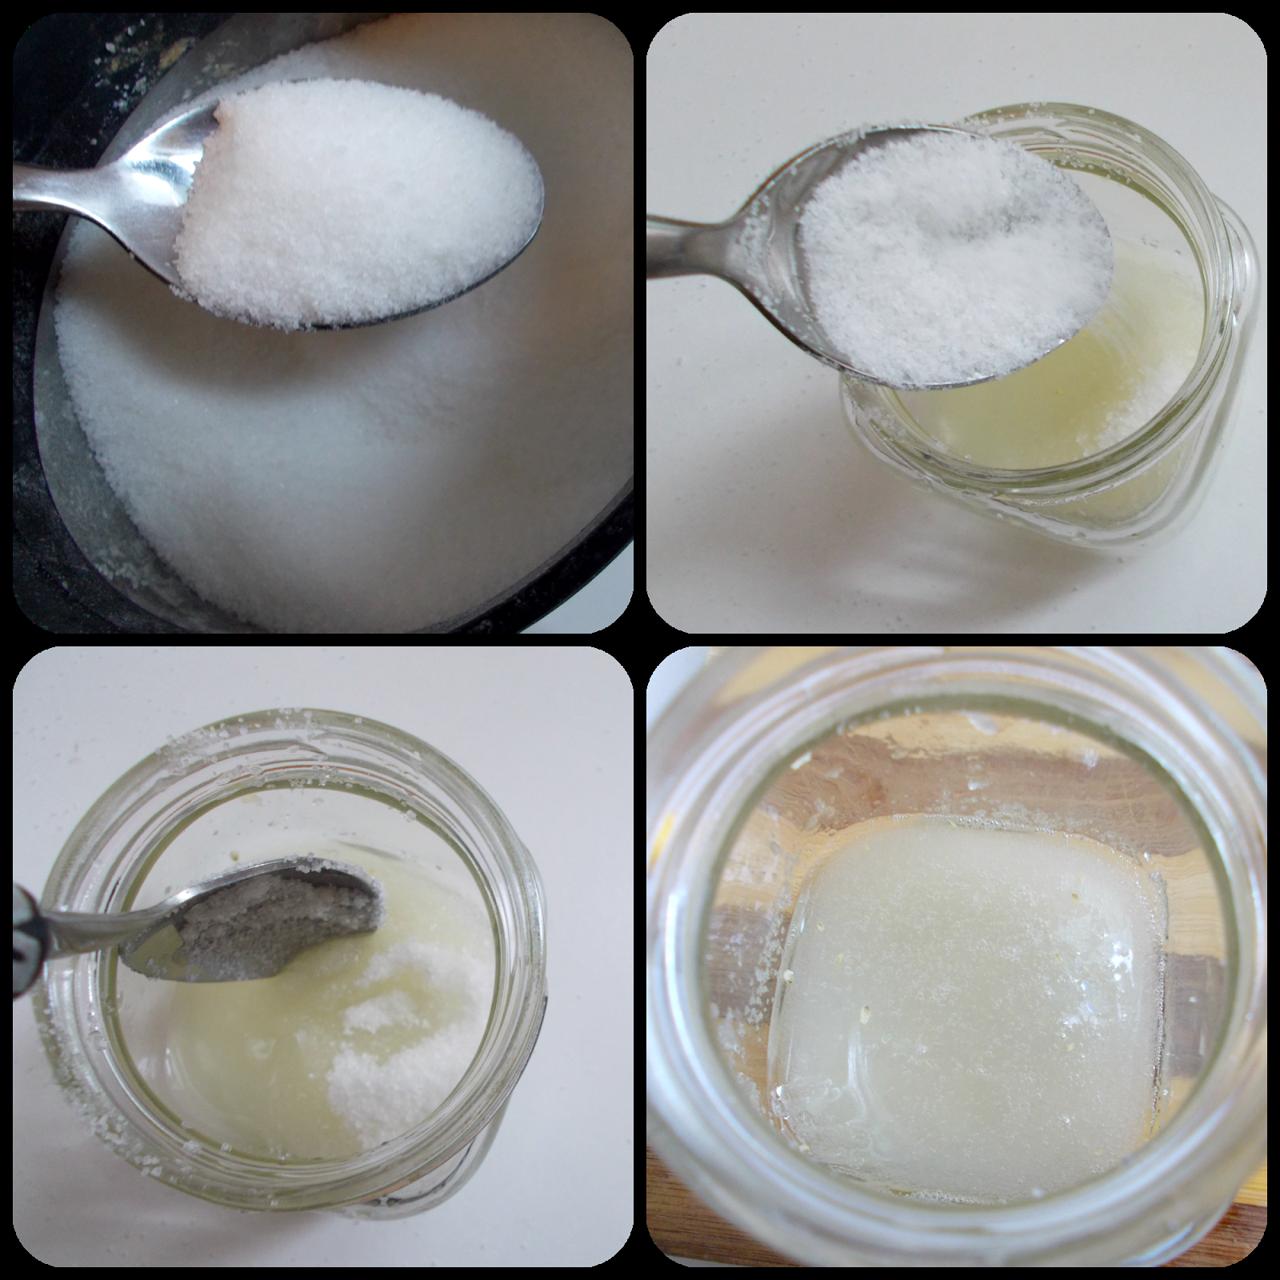 Sugar and Lemon Mix For Unwanted Facial Hair